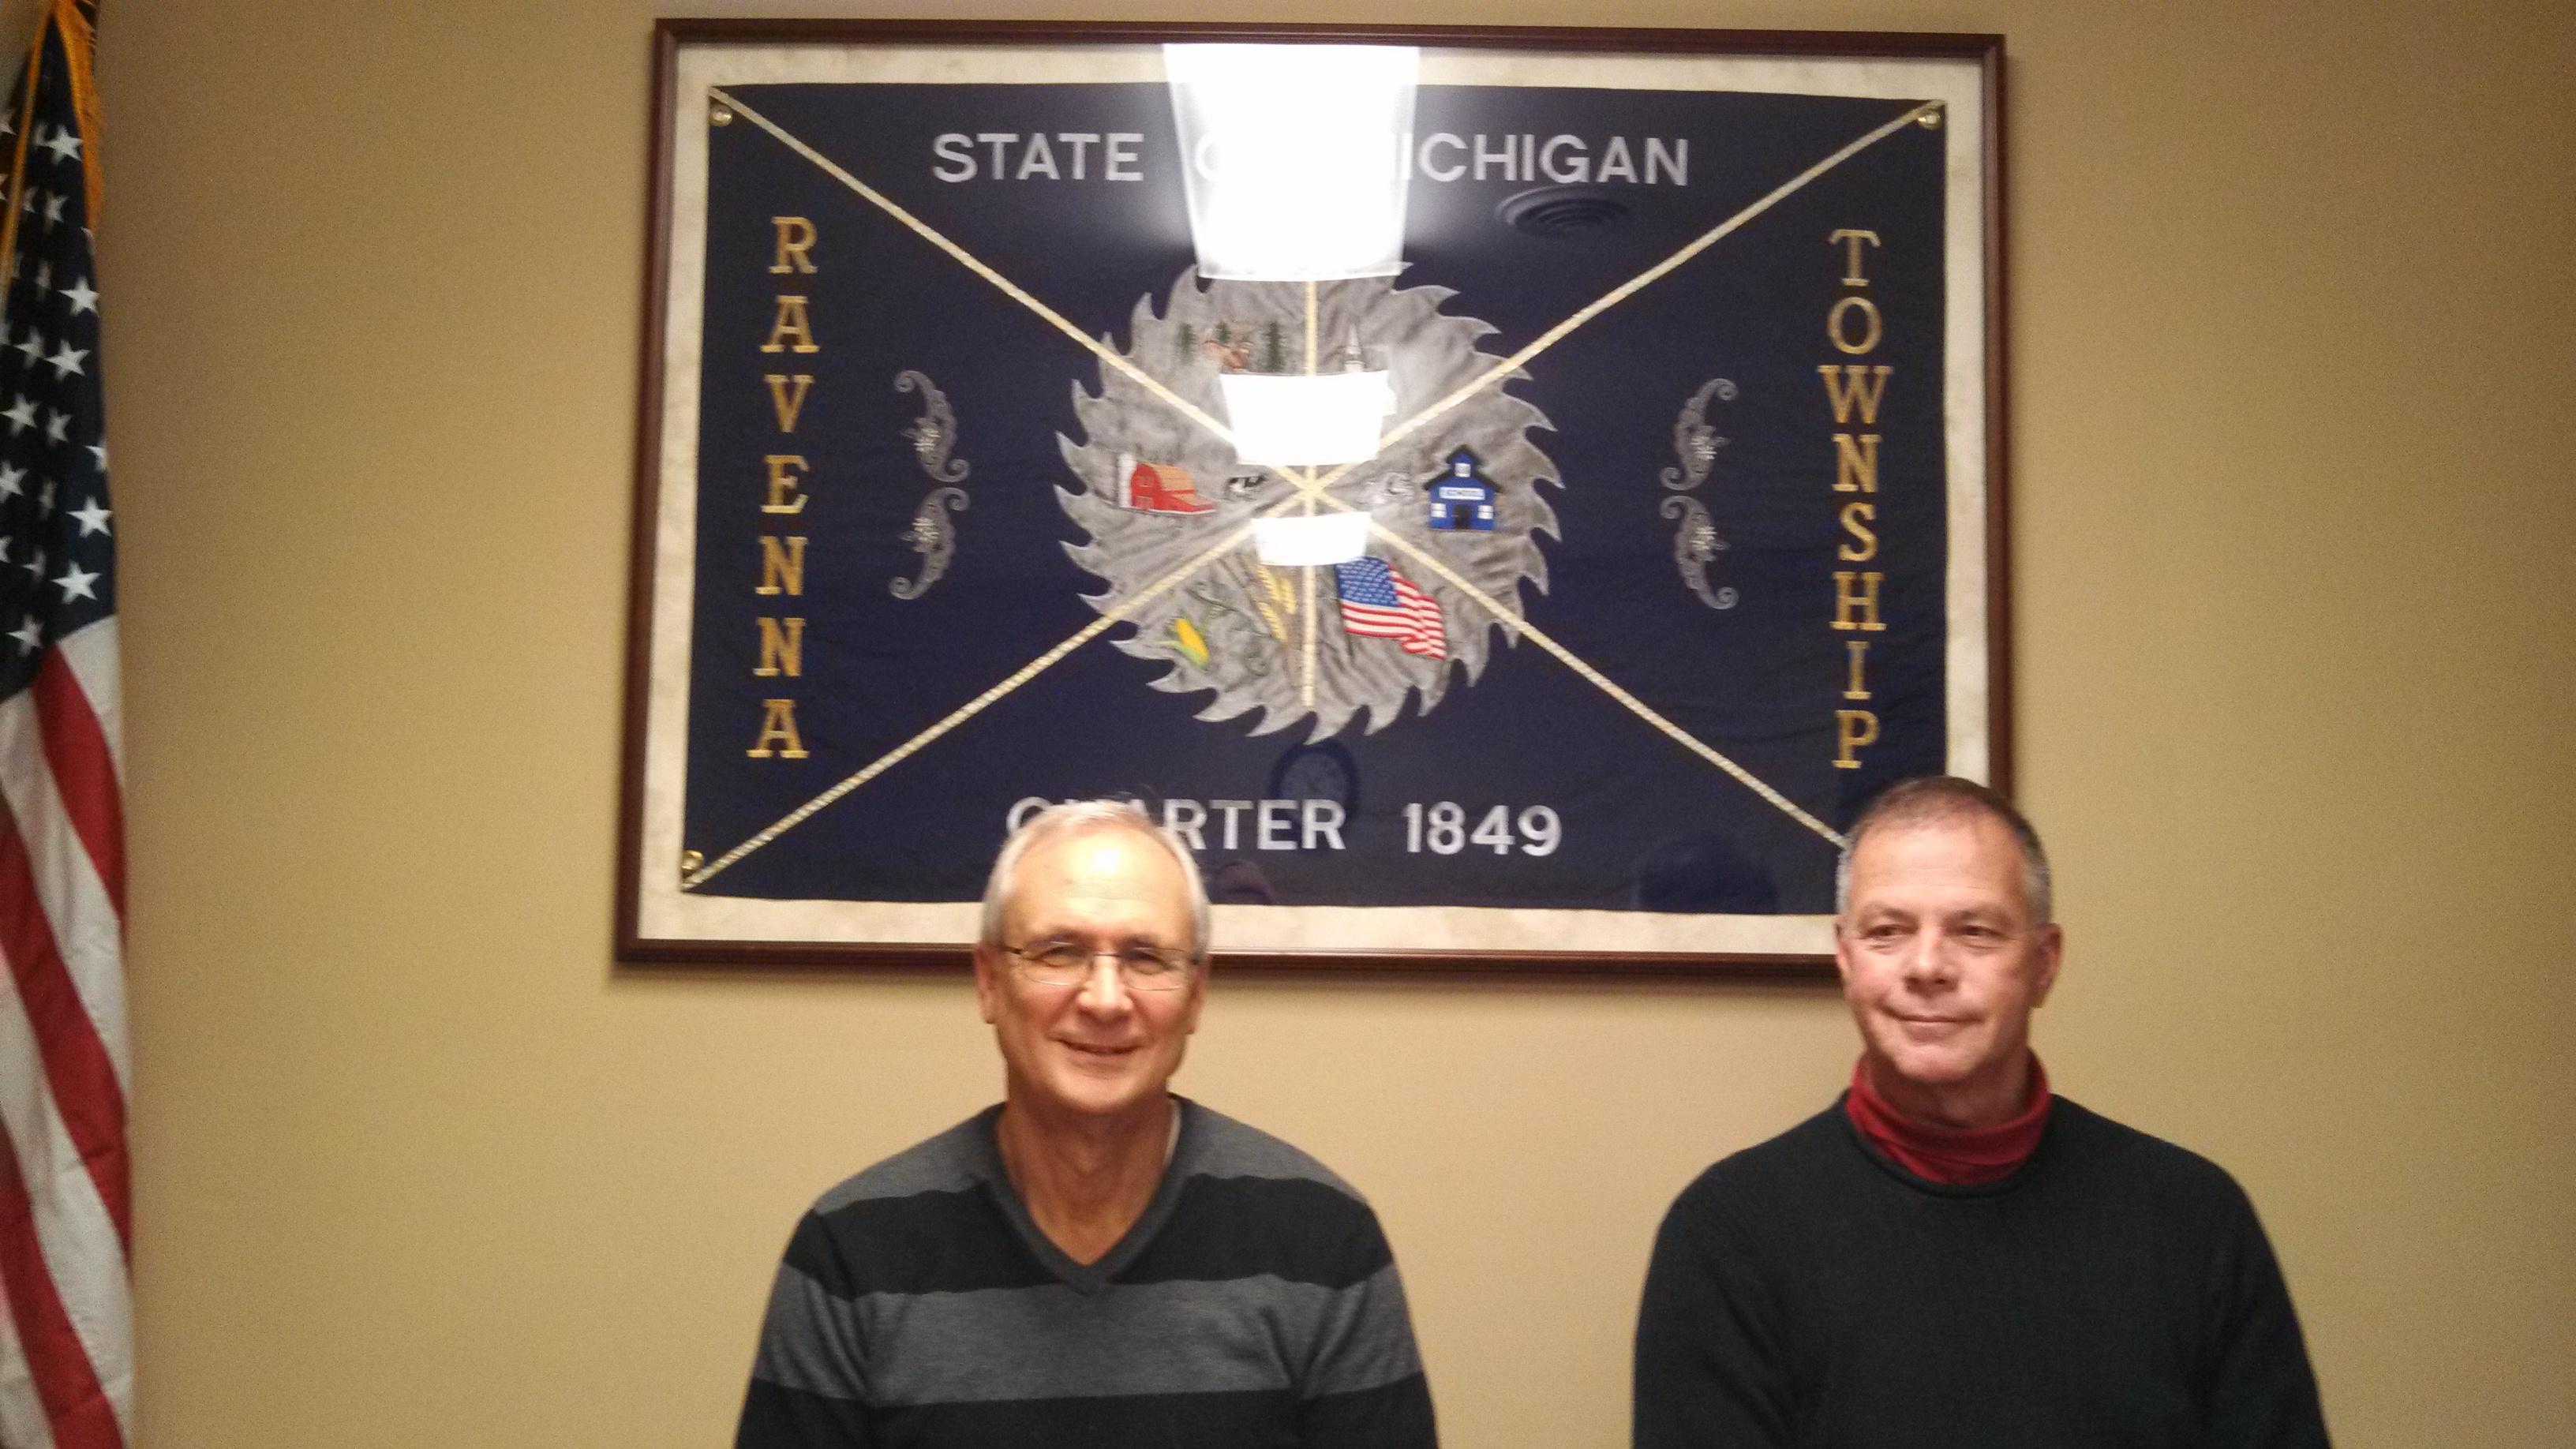 Ravenna Township Assessors Dennis Burns & Jerry Groenveld